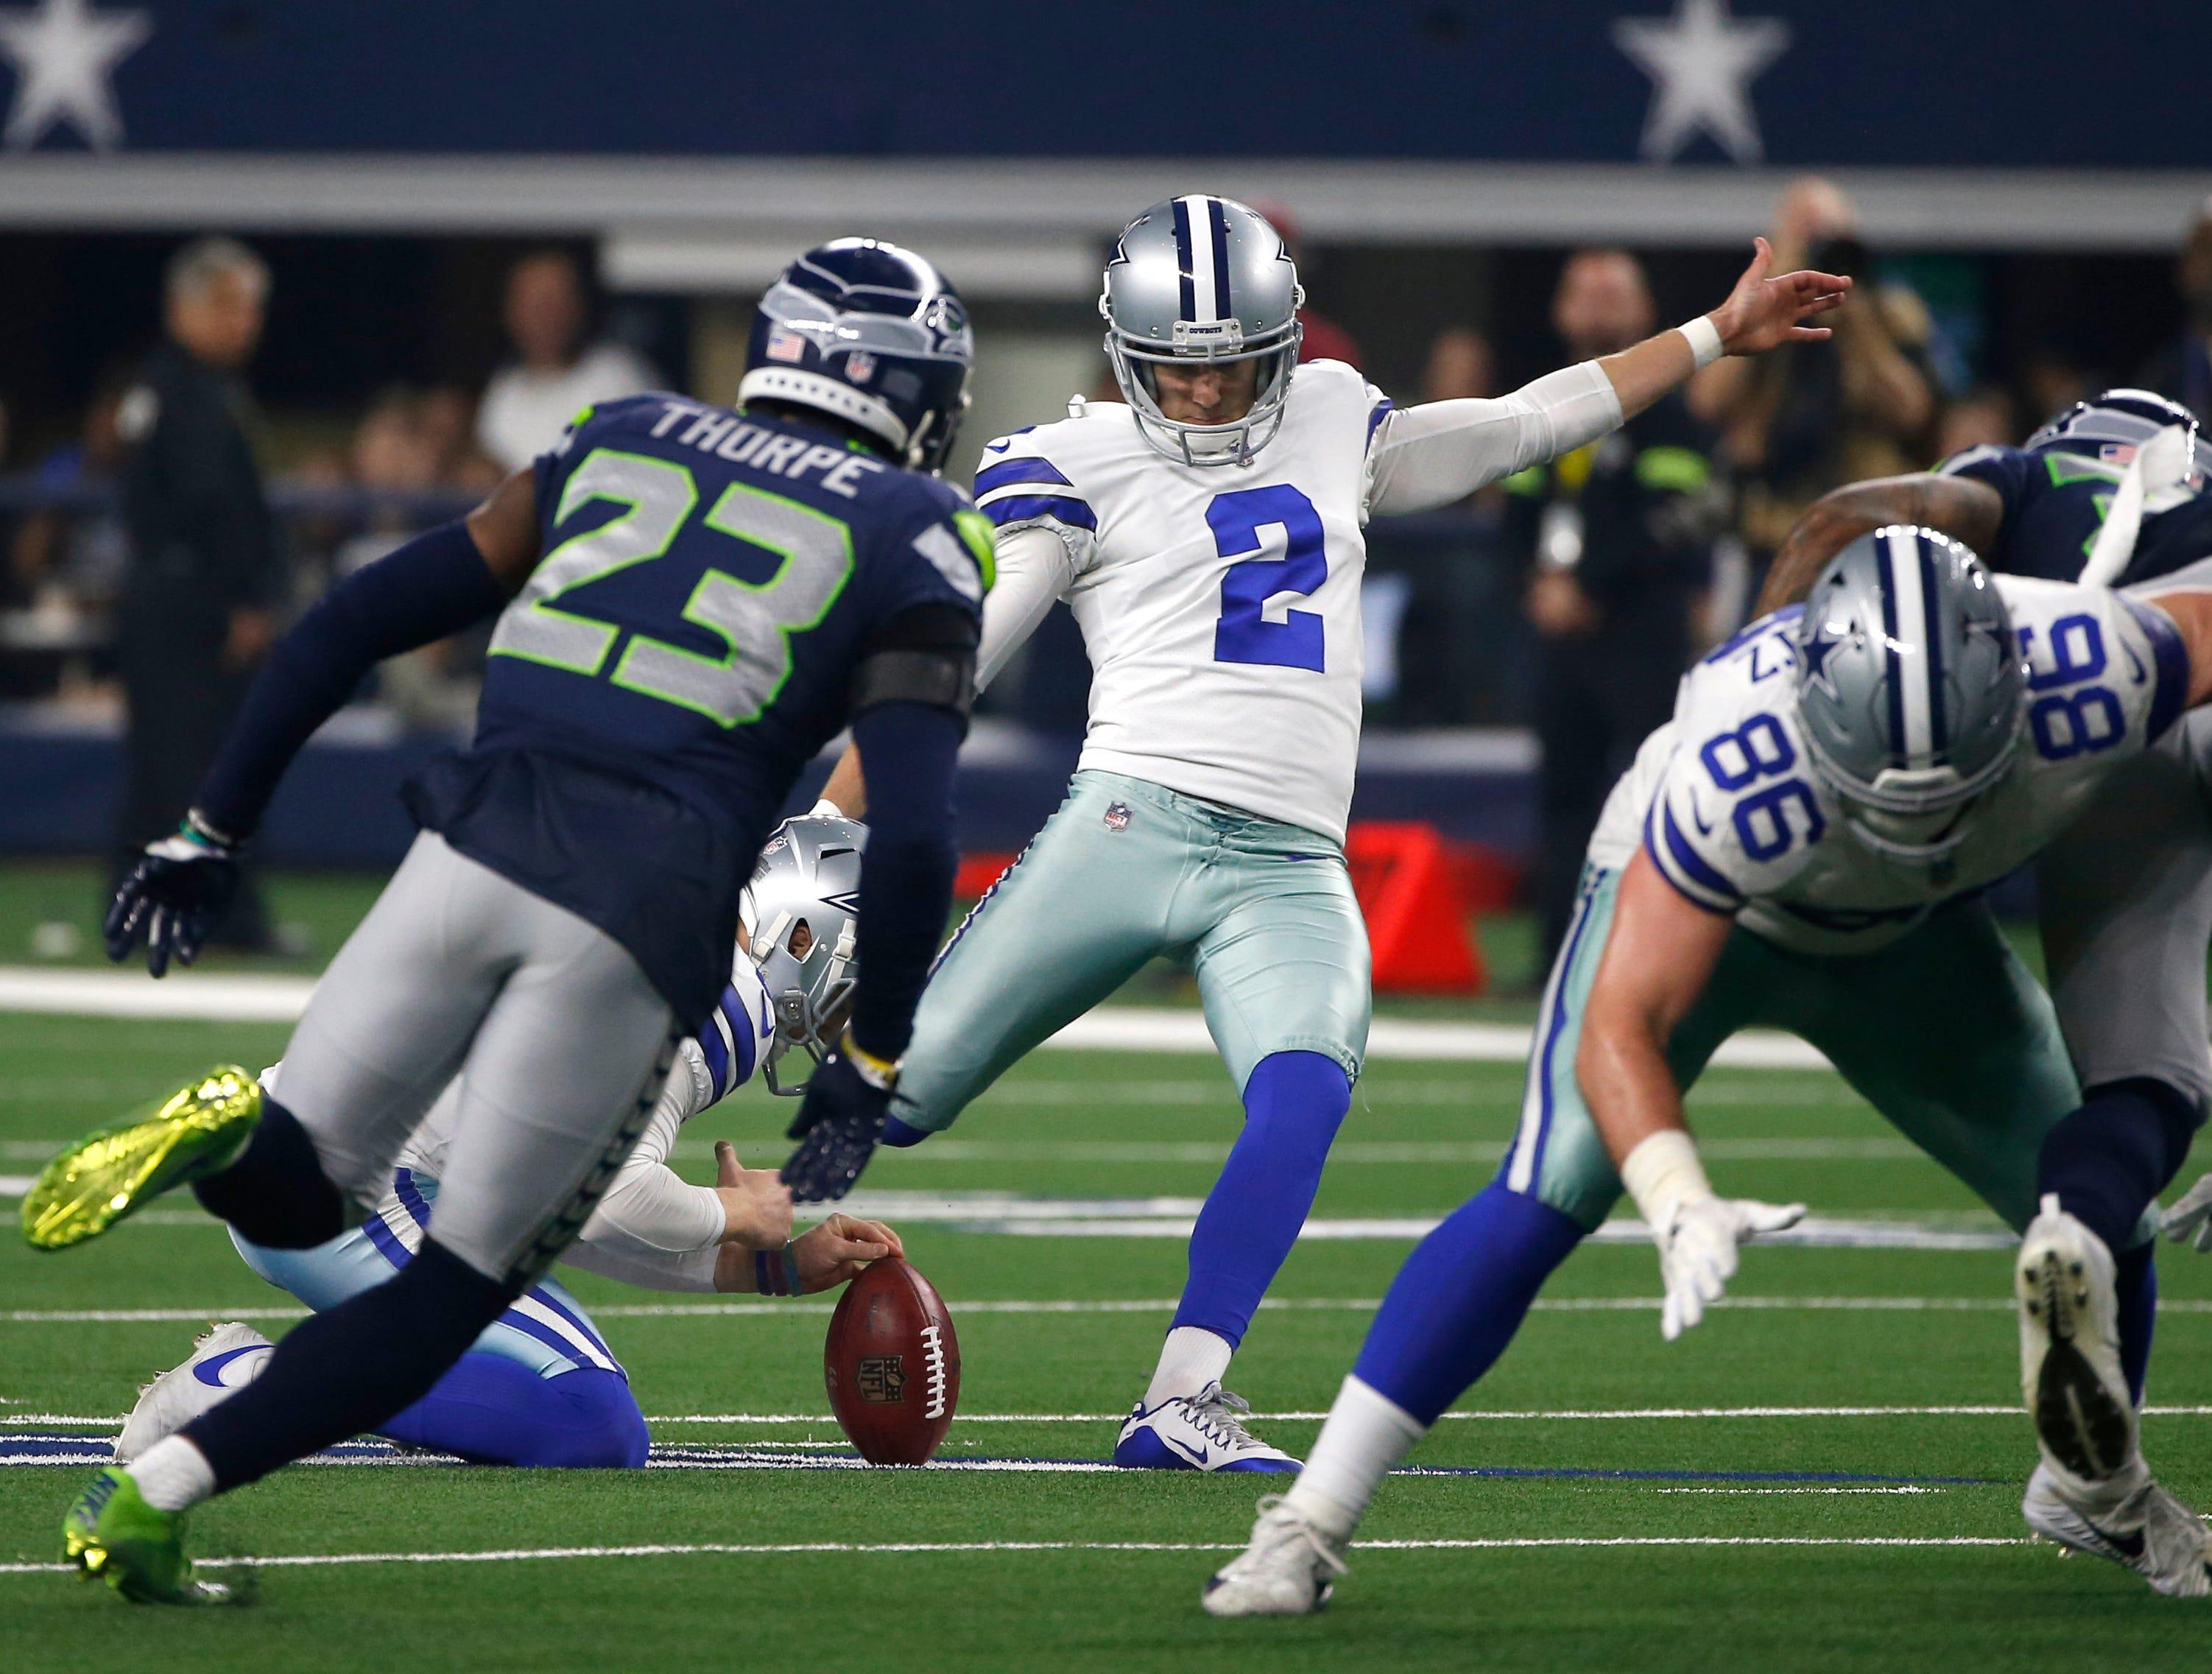 Seattle Seahawks cornerback Neiko Thorpe (23) rushes as Dallas Cowboys place kicker Brett Maher (2) attempts to score during an NFC wild-card NFL football game in Arlington, Texas, Saturday, Jan. 5, 2019.(AP Photo/Ron Jenkins)